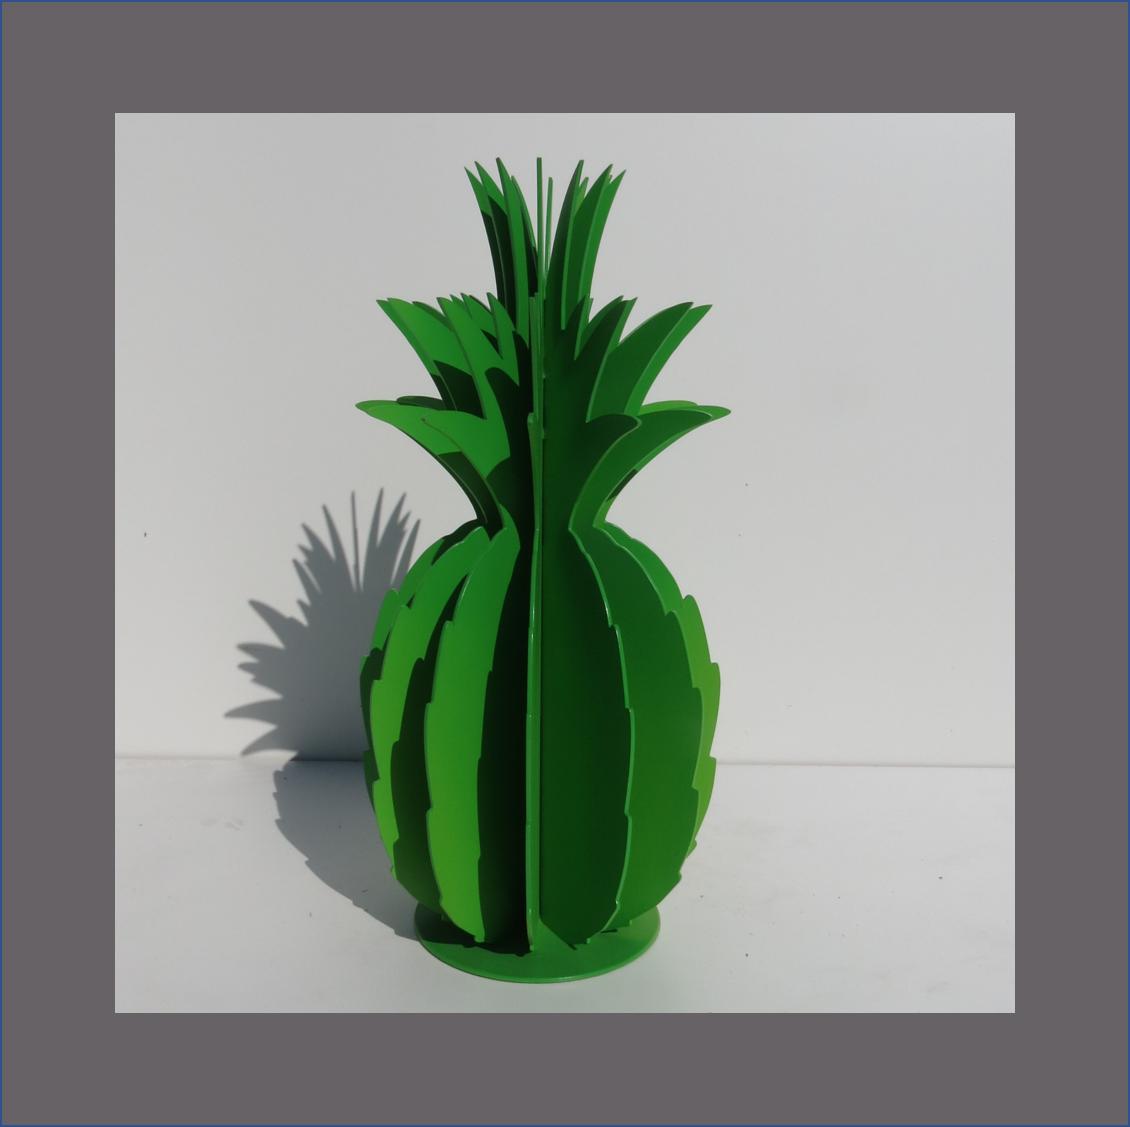 pineapple-3d